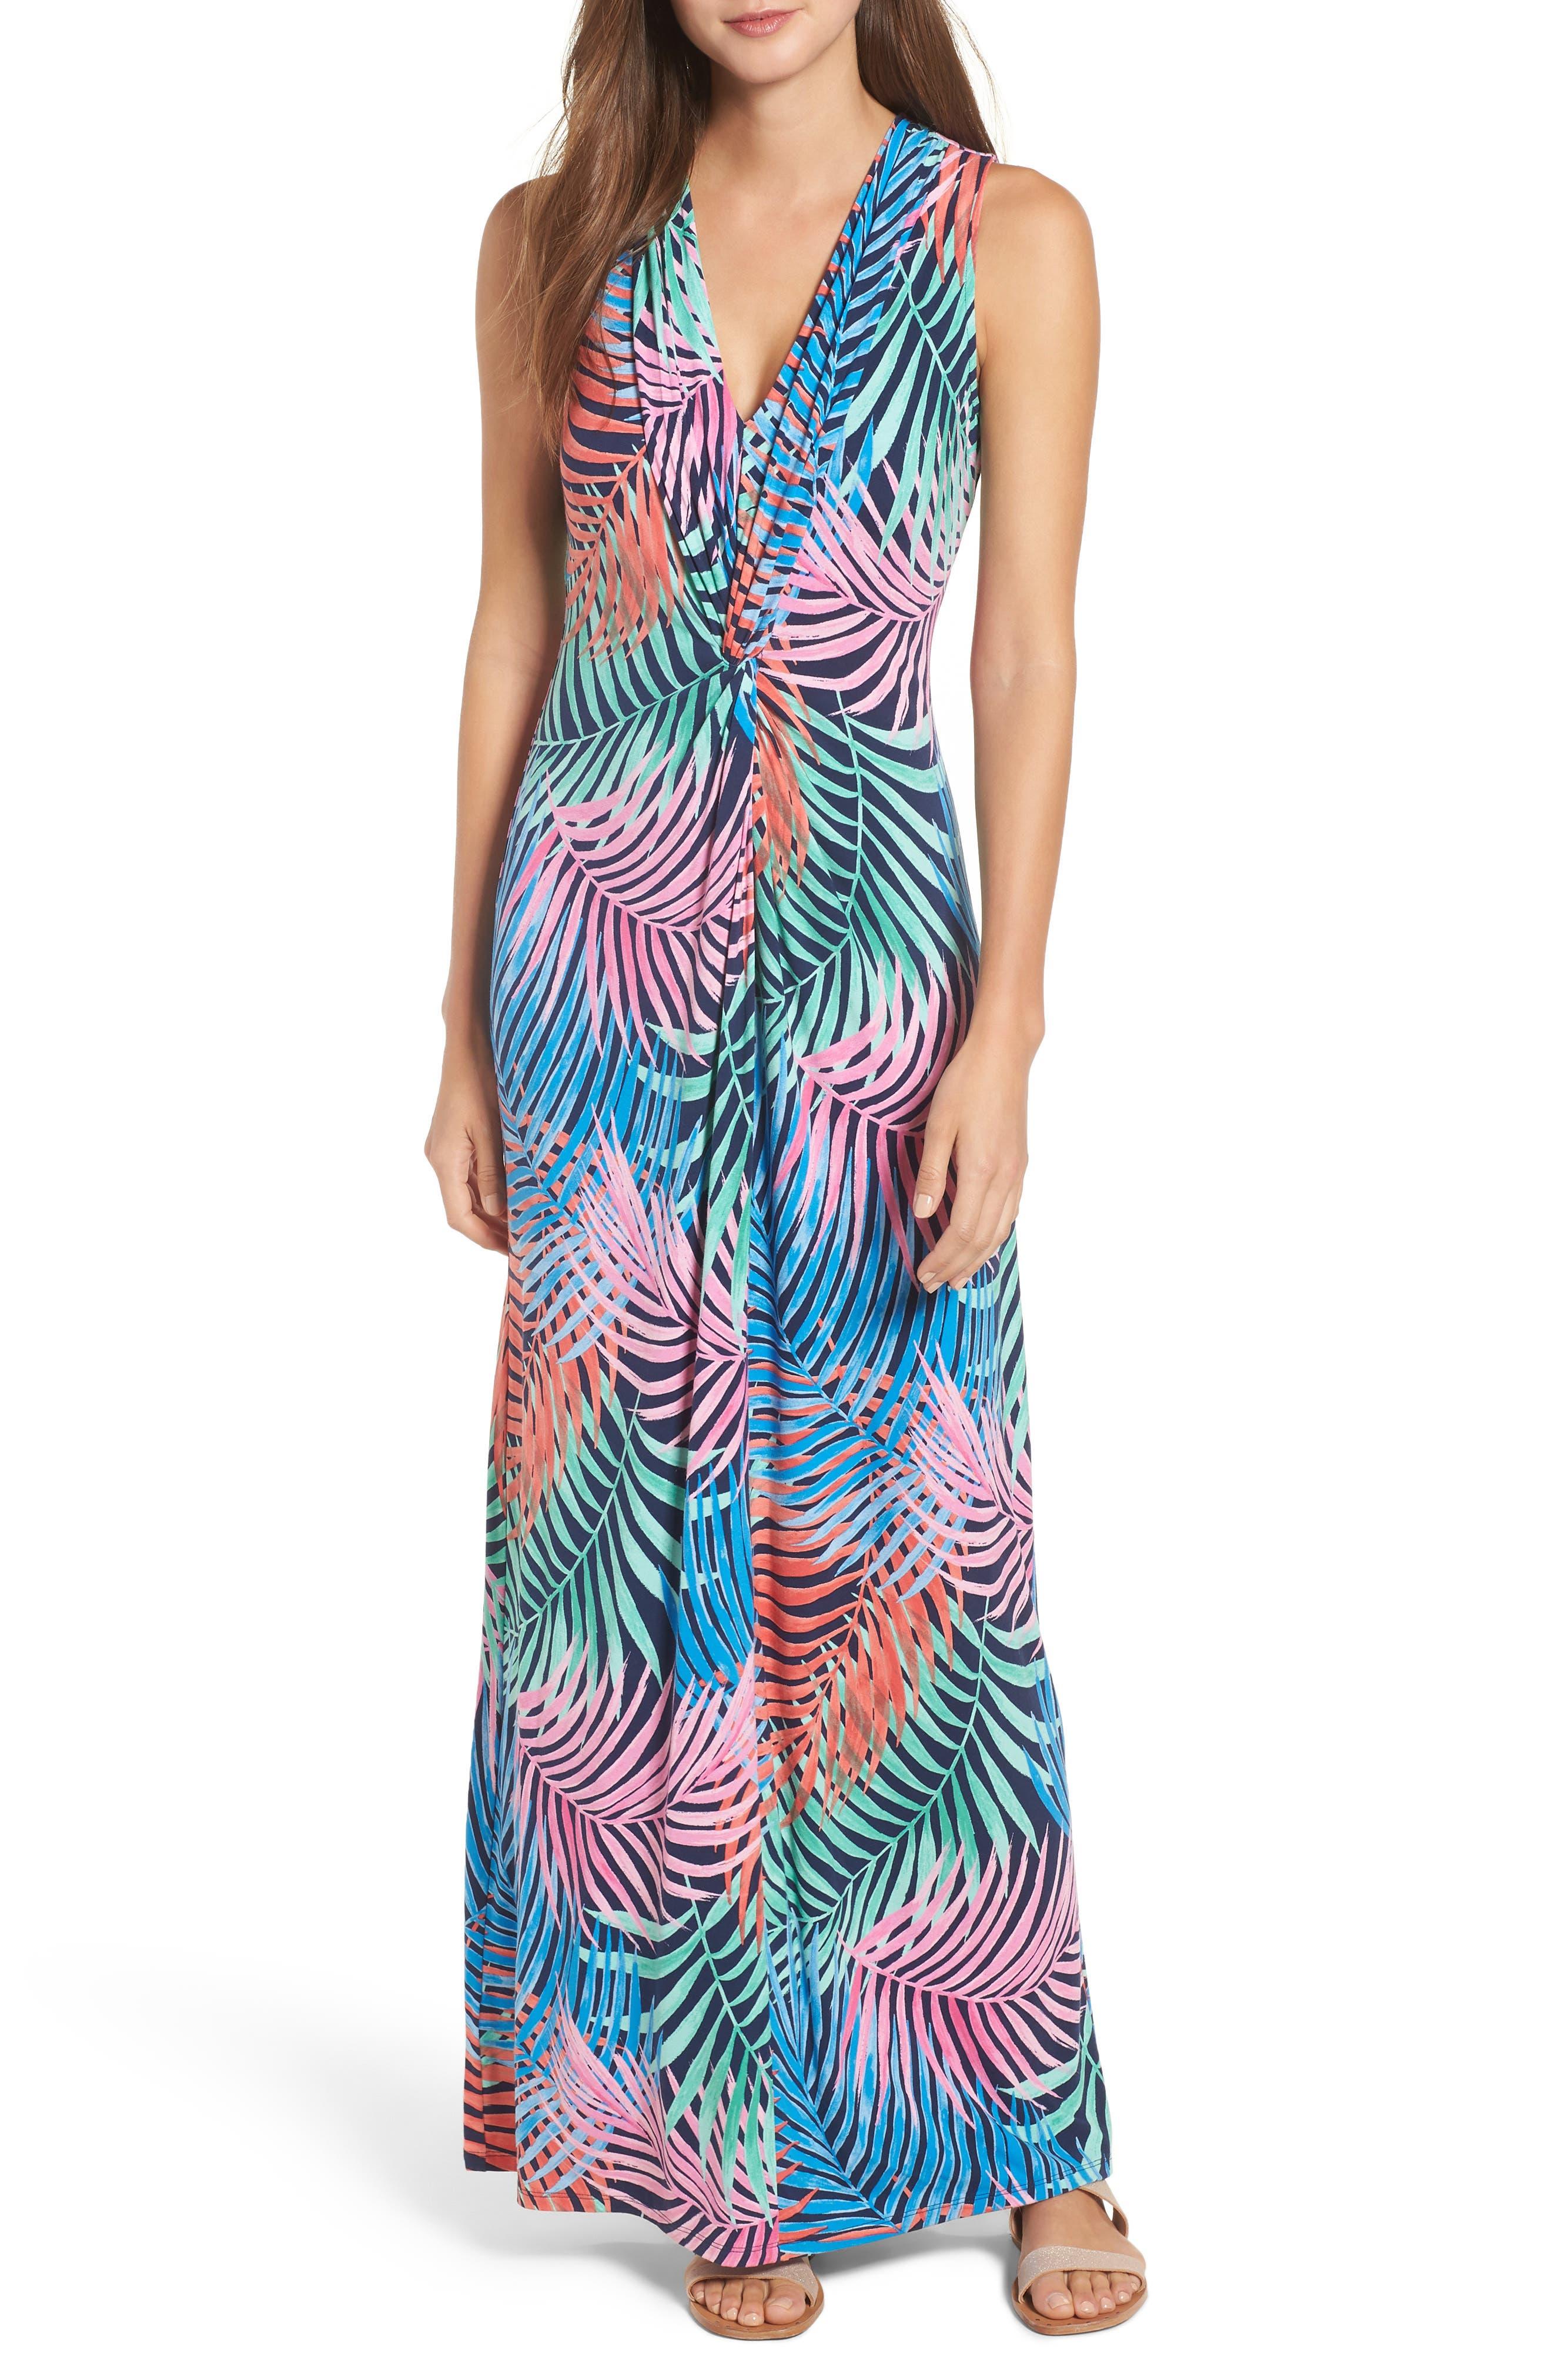 Tulum Trance Twist Maxi Dress,                             Main thumbnail 1, color,                             OCEAN DEEP